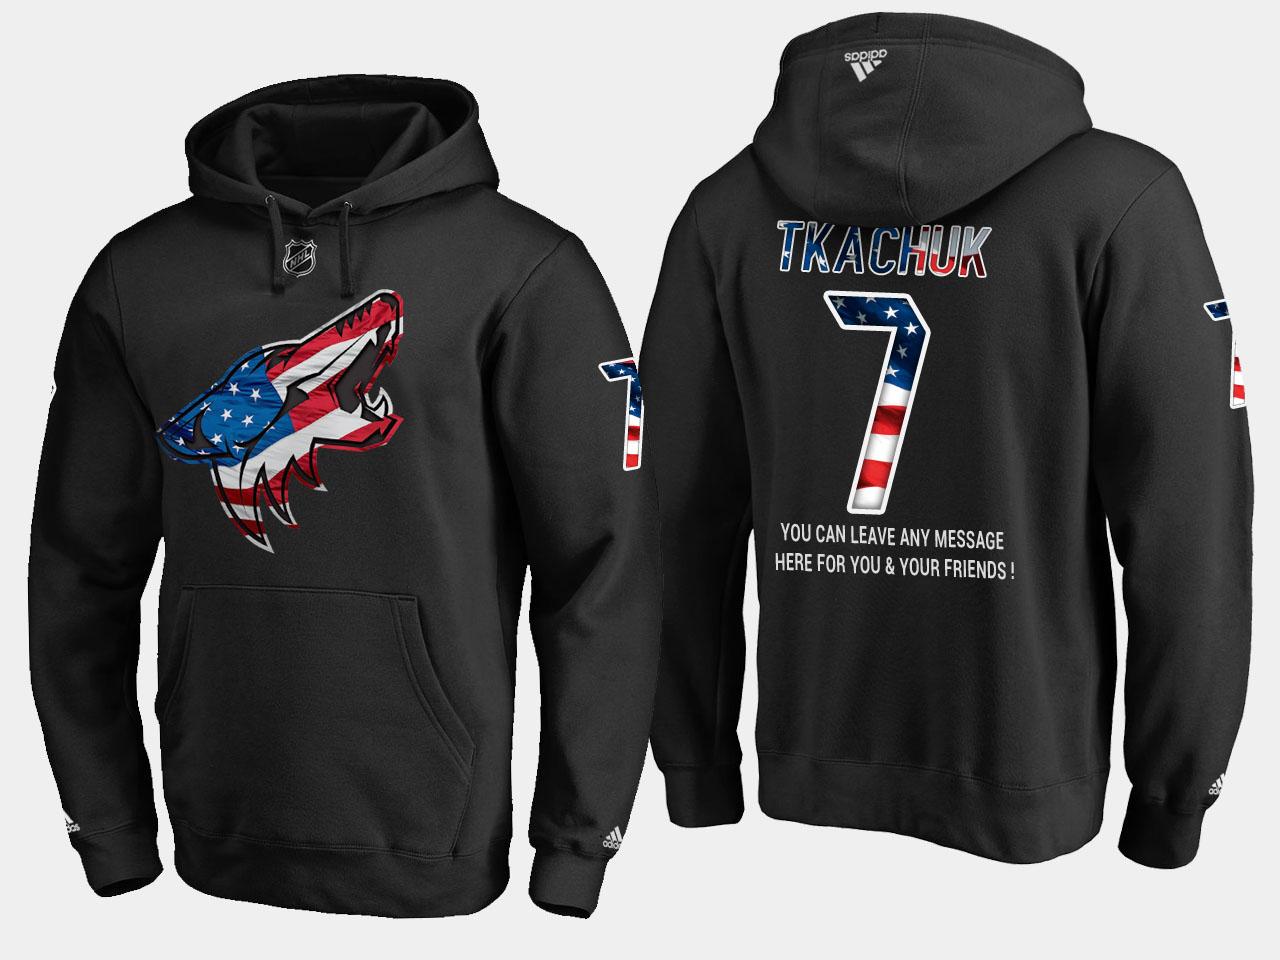 Coyotes #7 Keith Tkachuk NHL Banner Wave Usa Flag Black Hoodie